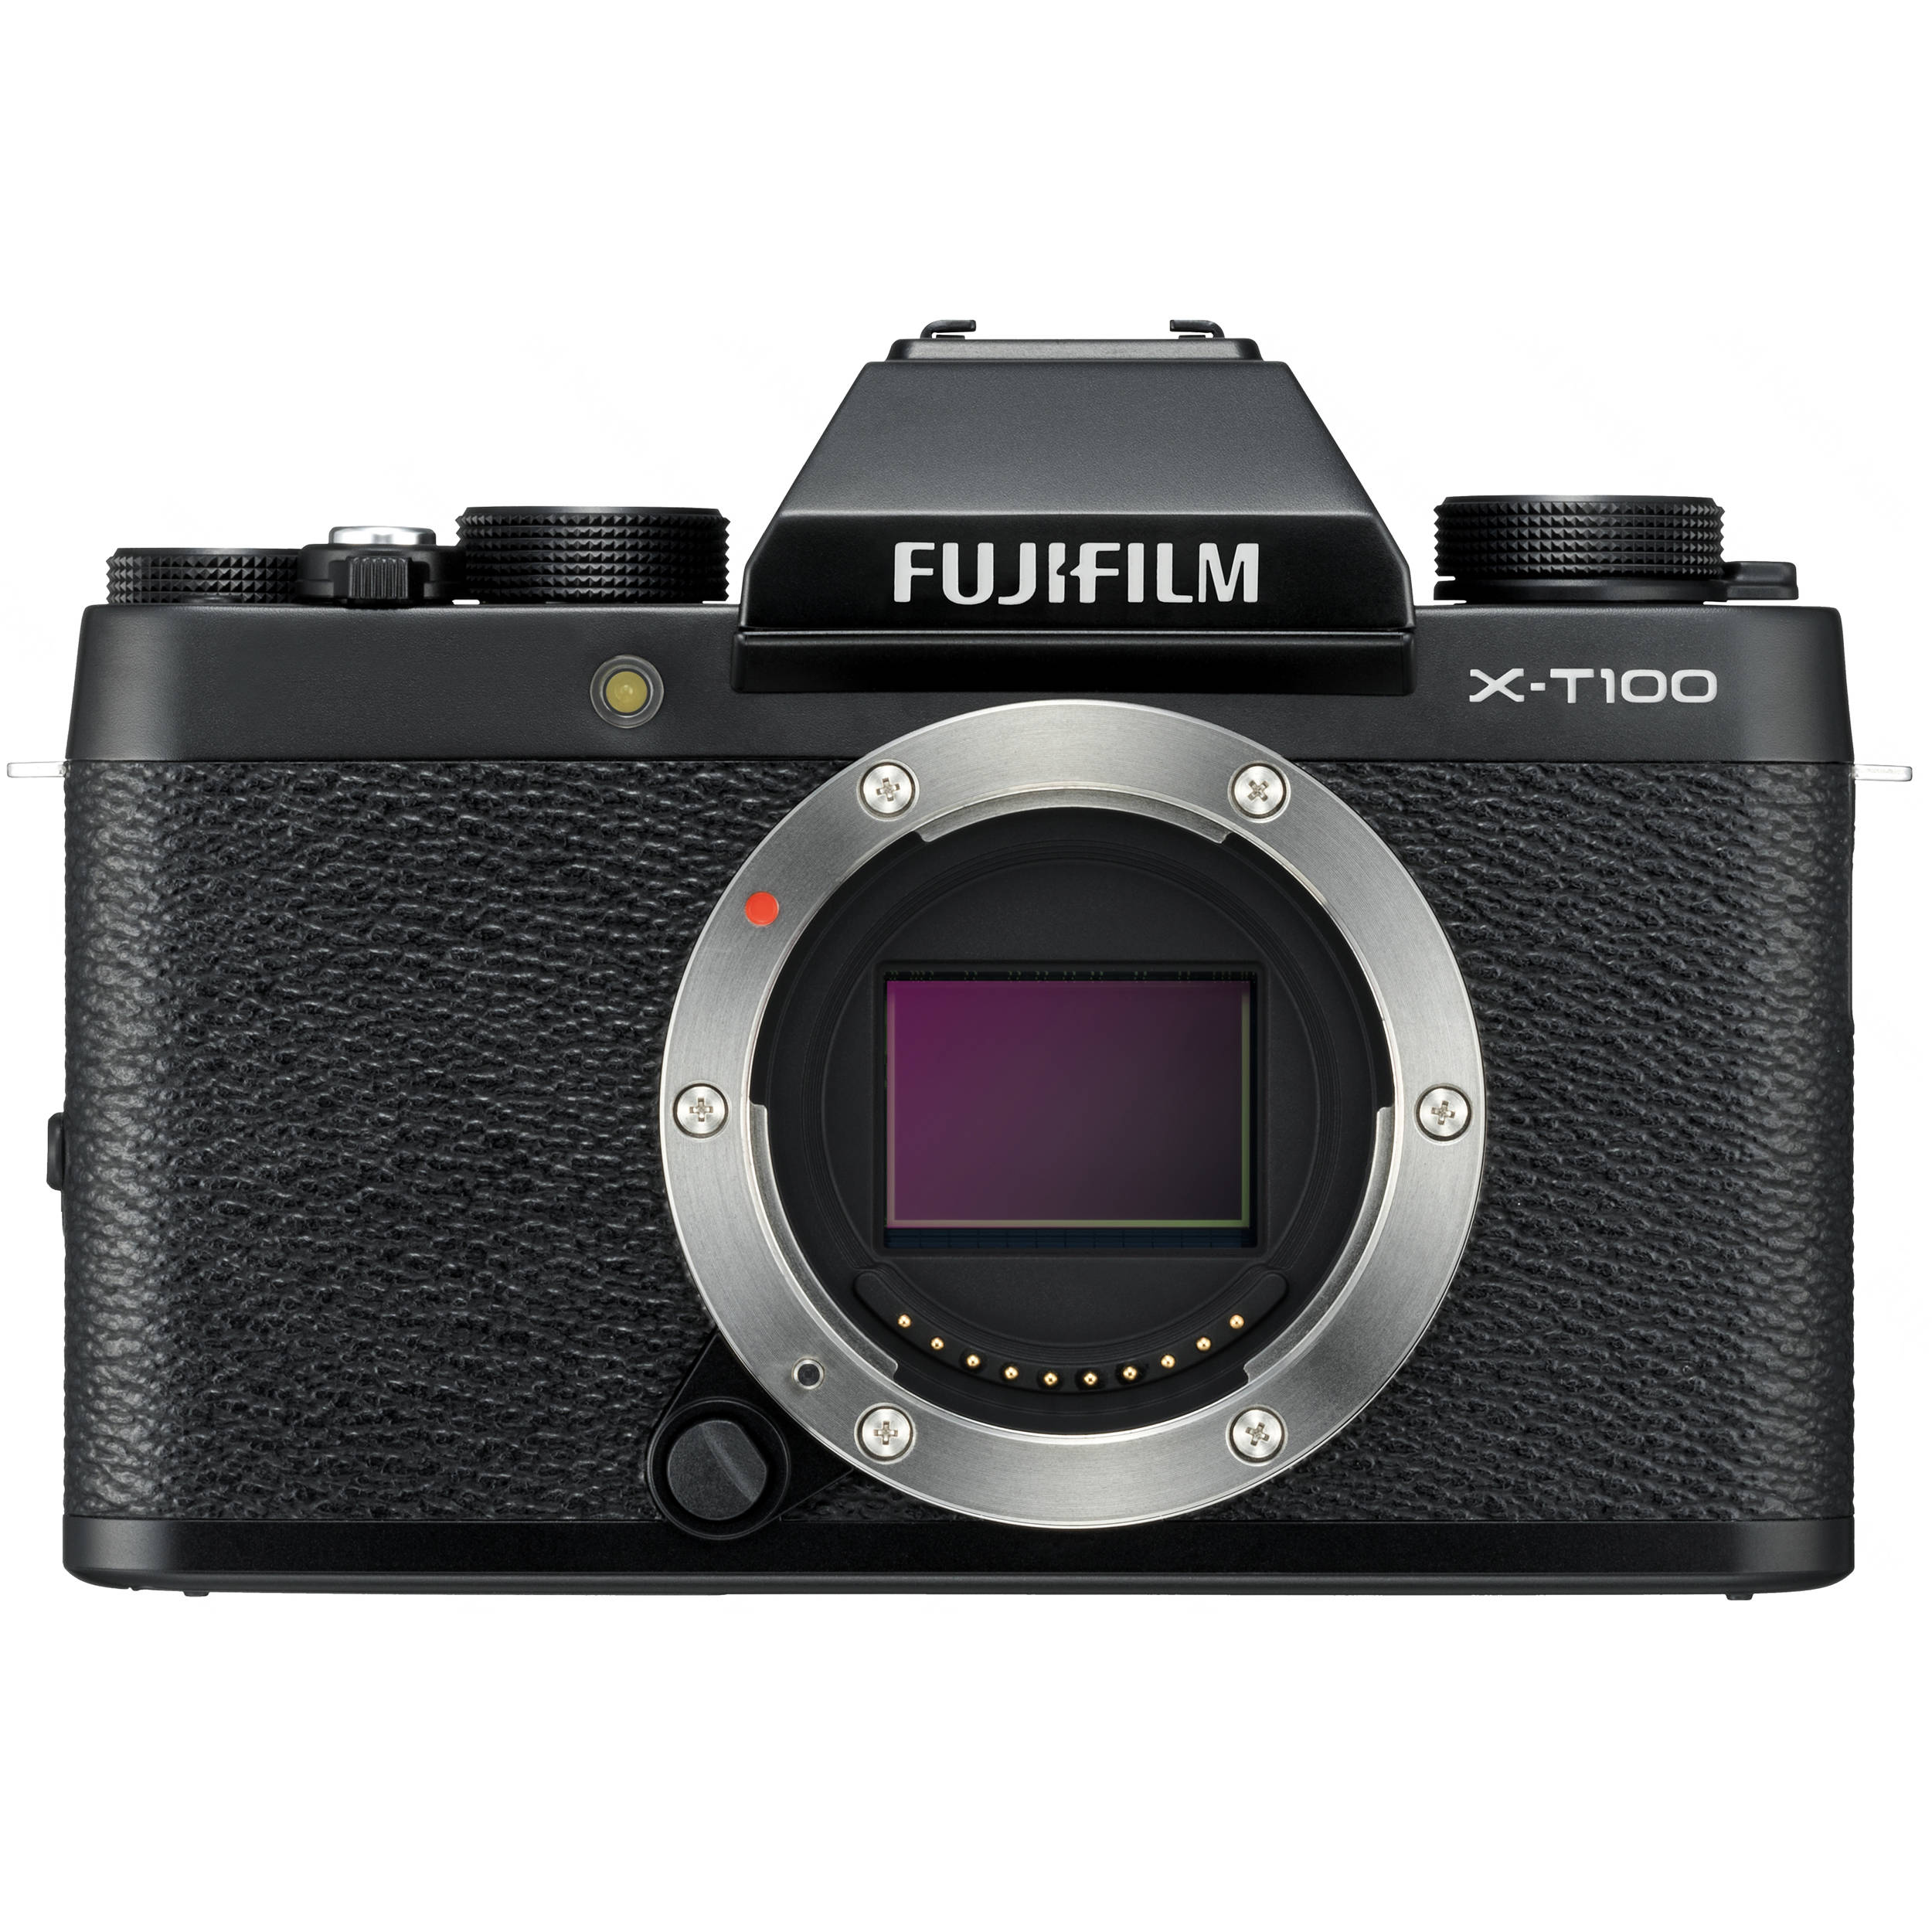 FUJIFILM X-T100 (tělo) Barva X-T100: Černá